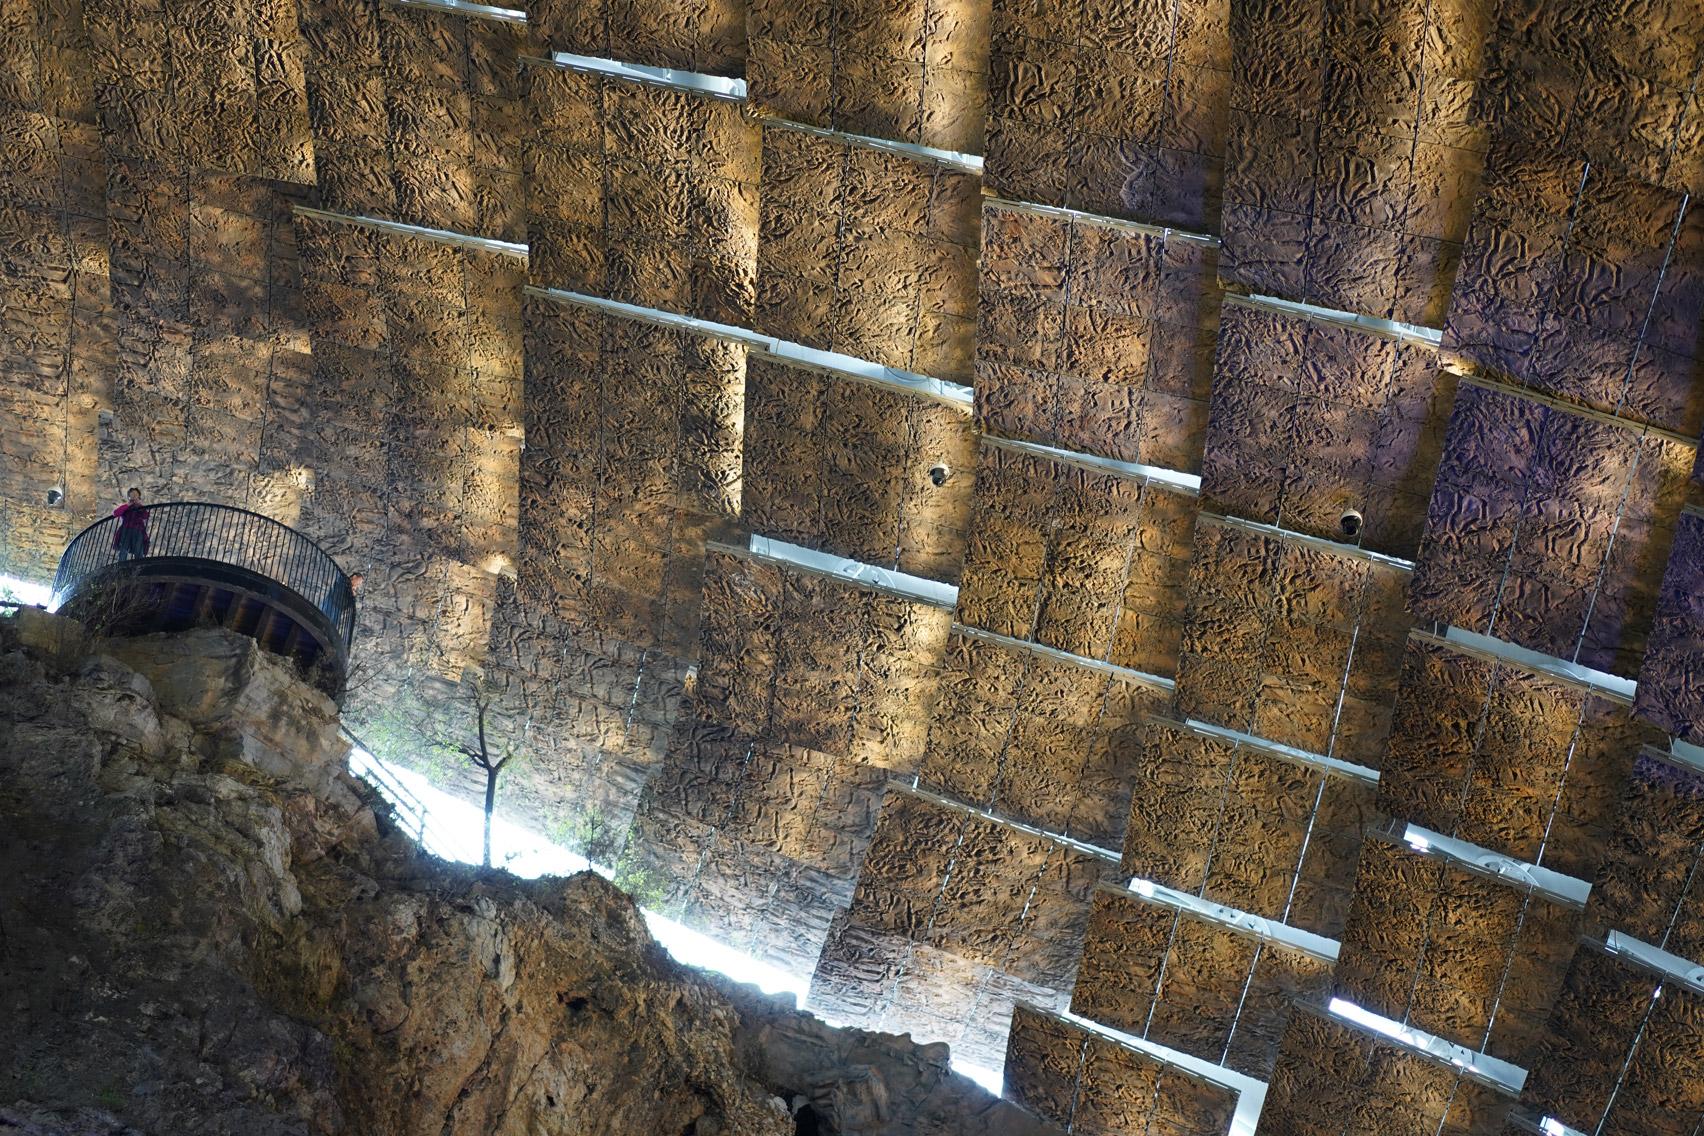 A shelter made from textured fibreglass panels